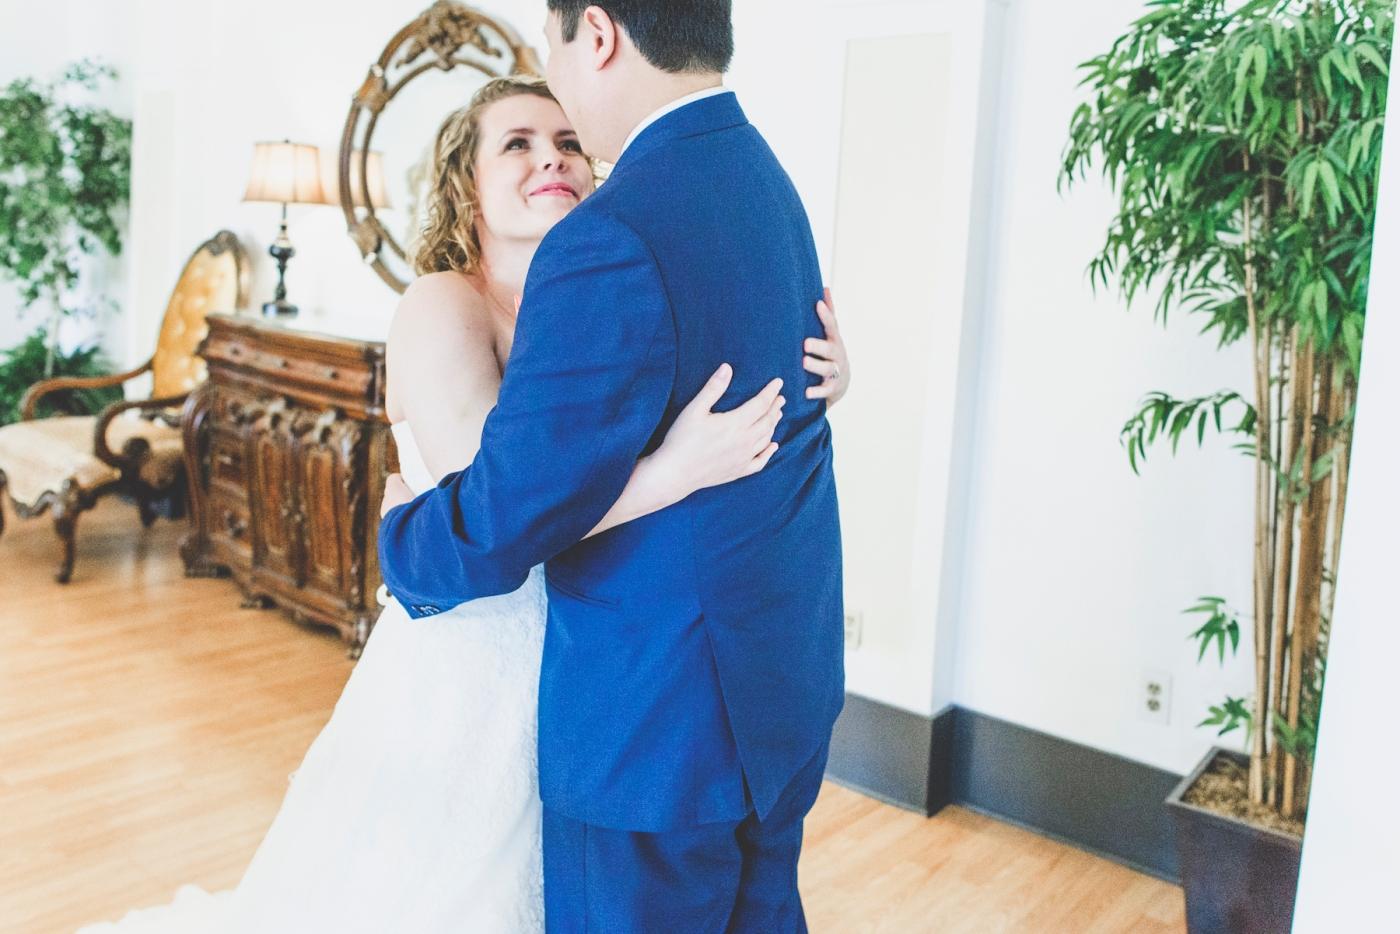 DSC_2049Everett_Wedding_Ballroom_Jane_Speleers_photography_Rachel_and_Edmund_First_look_2017